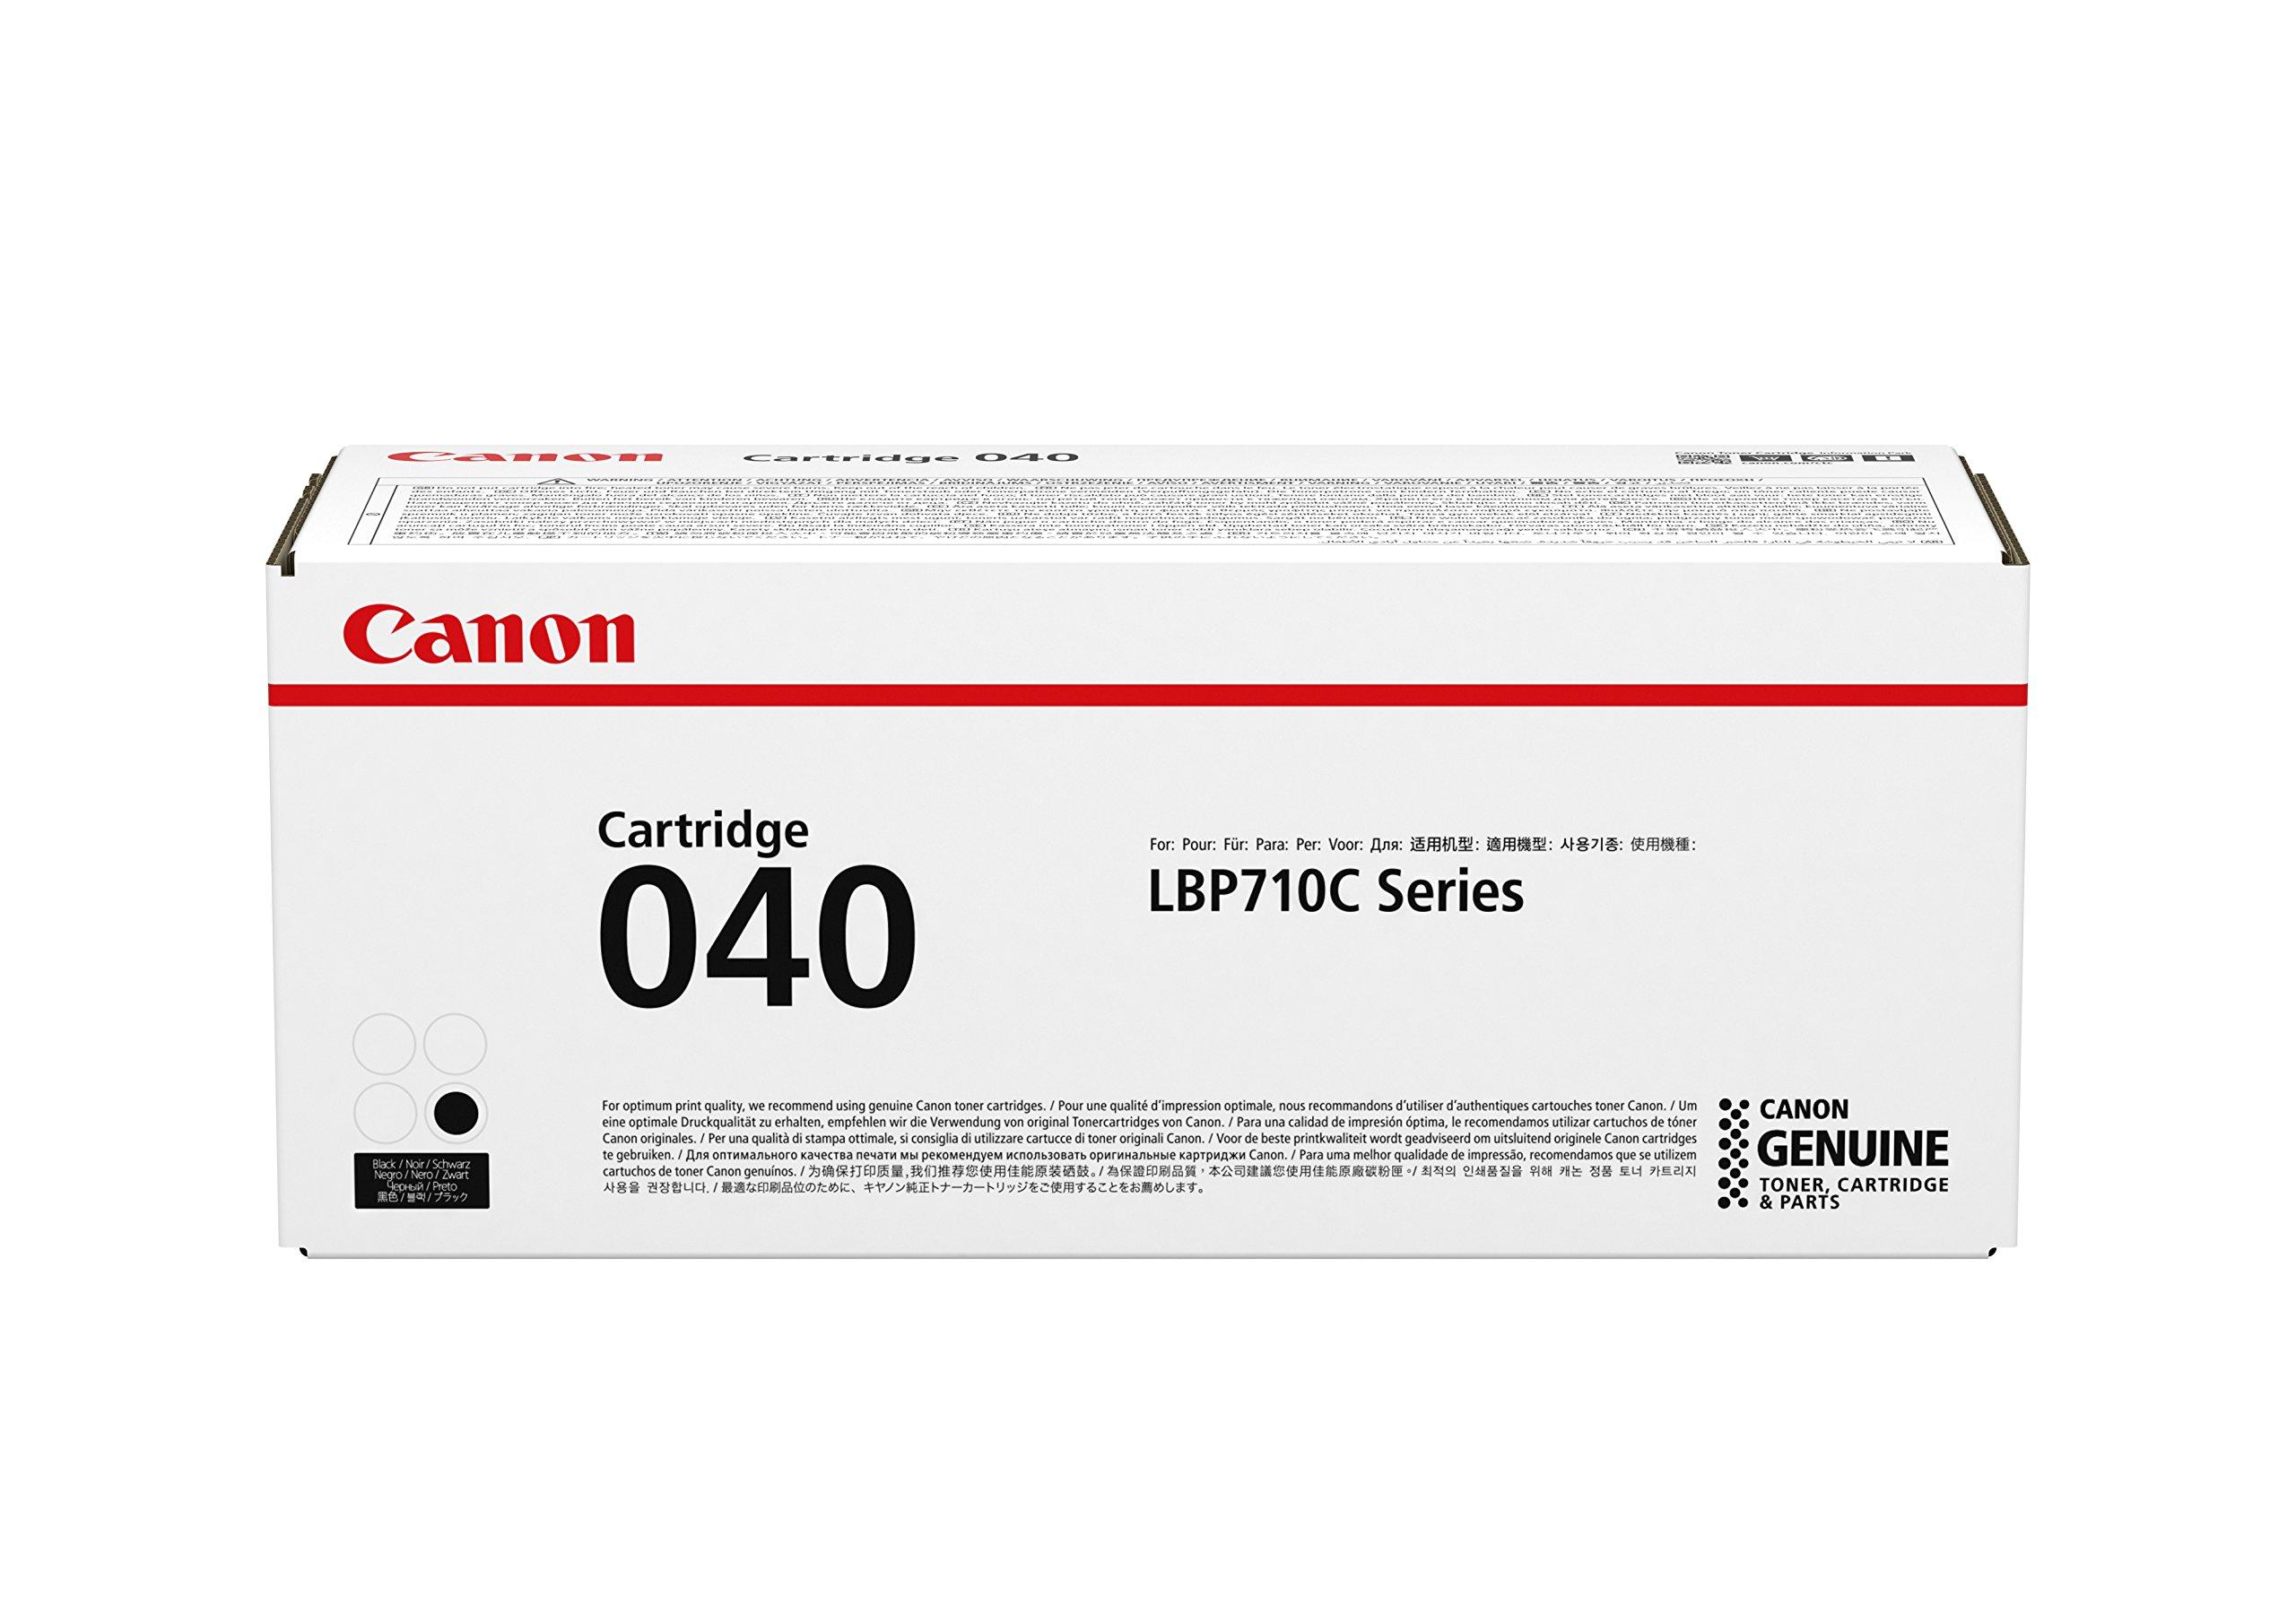 Canon Genuine Toner, Cartridge 040 Black (0460C001), 1 Pack, for Canon Color imageCLASS LBP712Cdn Laser Printer,Yellow